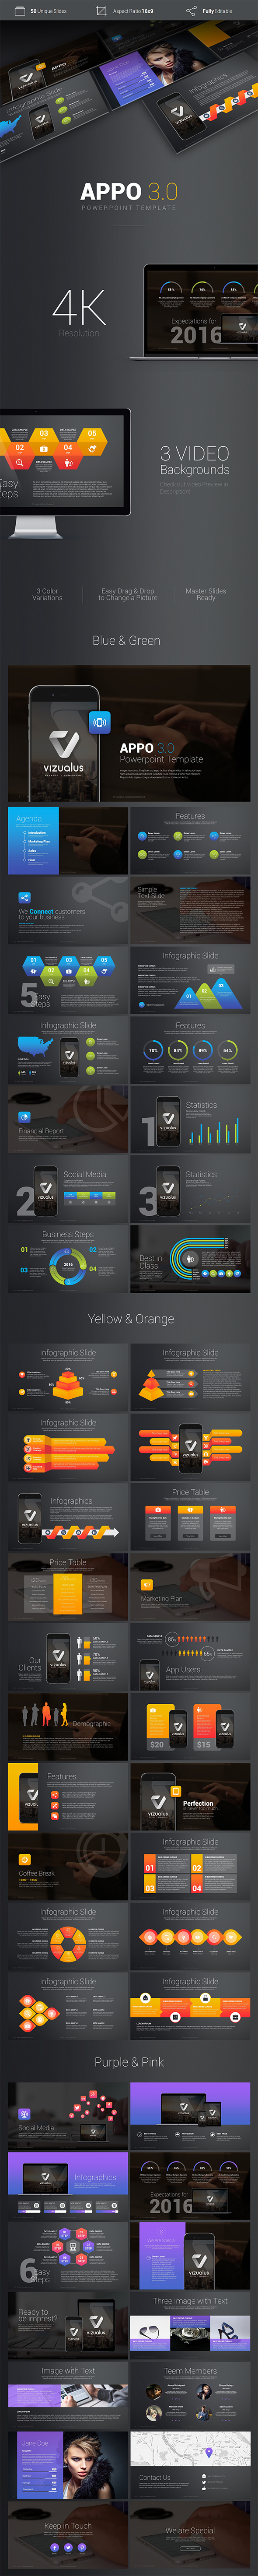 Premium App Powerpoint Template - PowerPoint Templates Presentation Templates